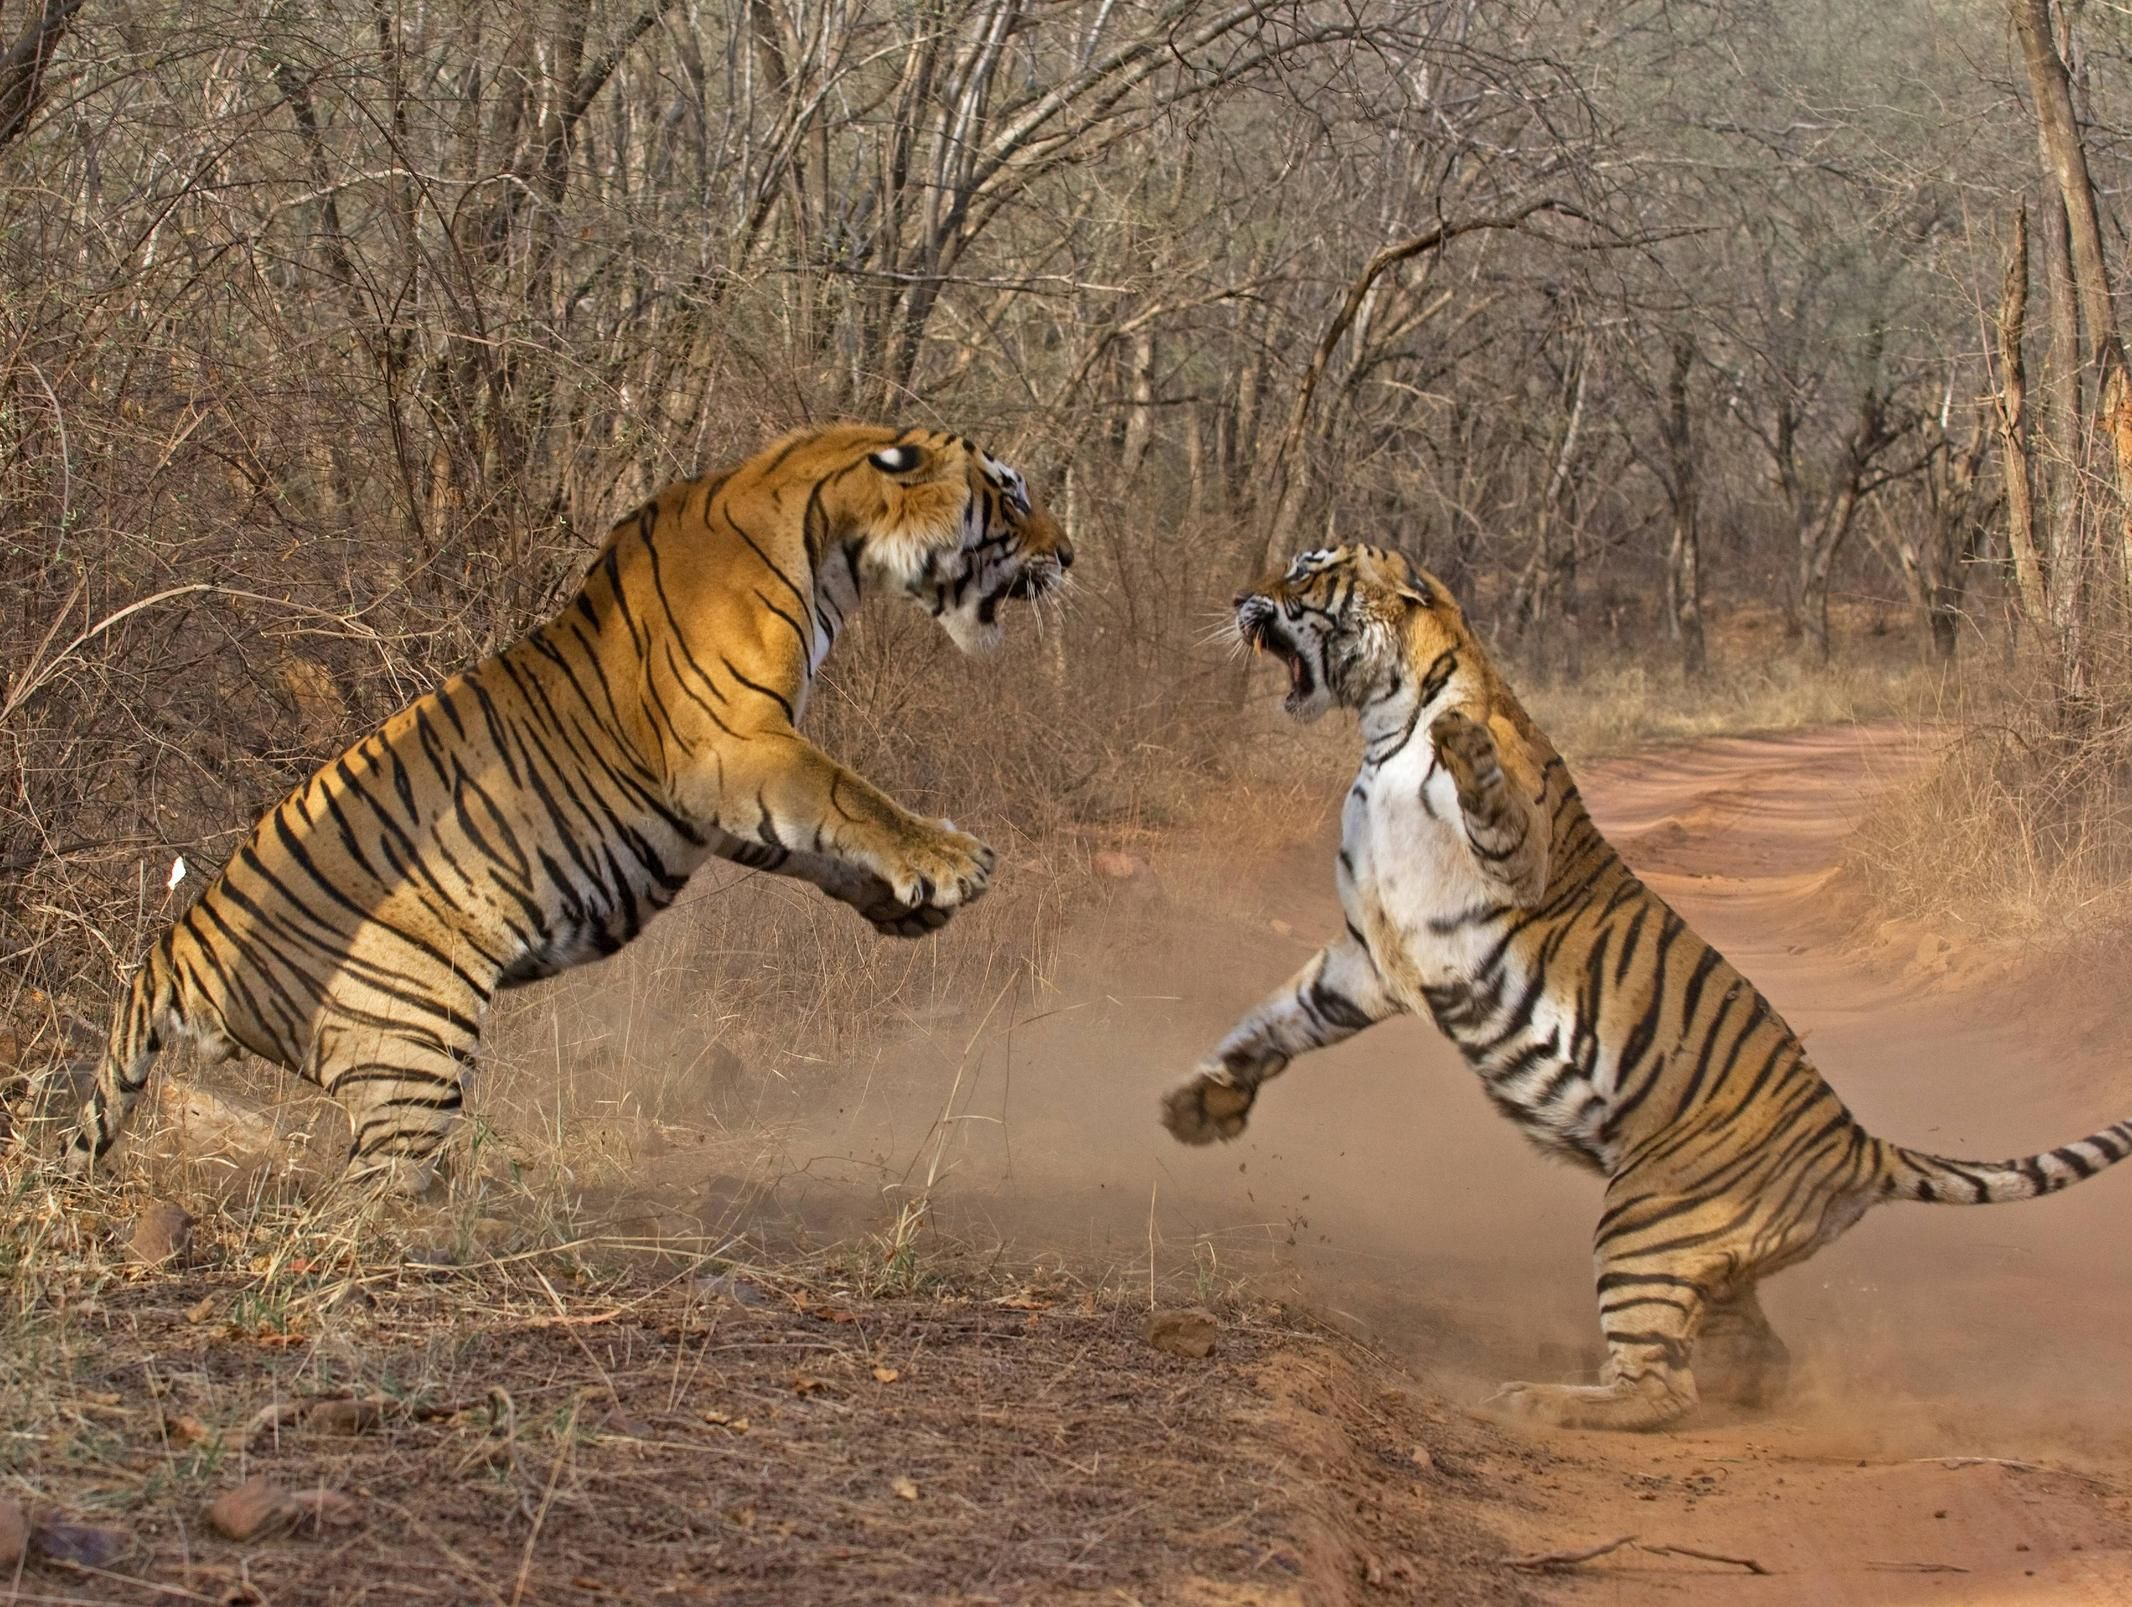 tiger fight Google Search Fight tiger, Big cats, Tiger